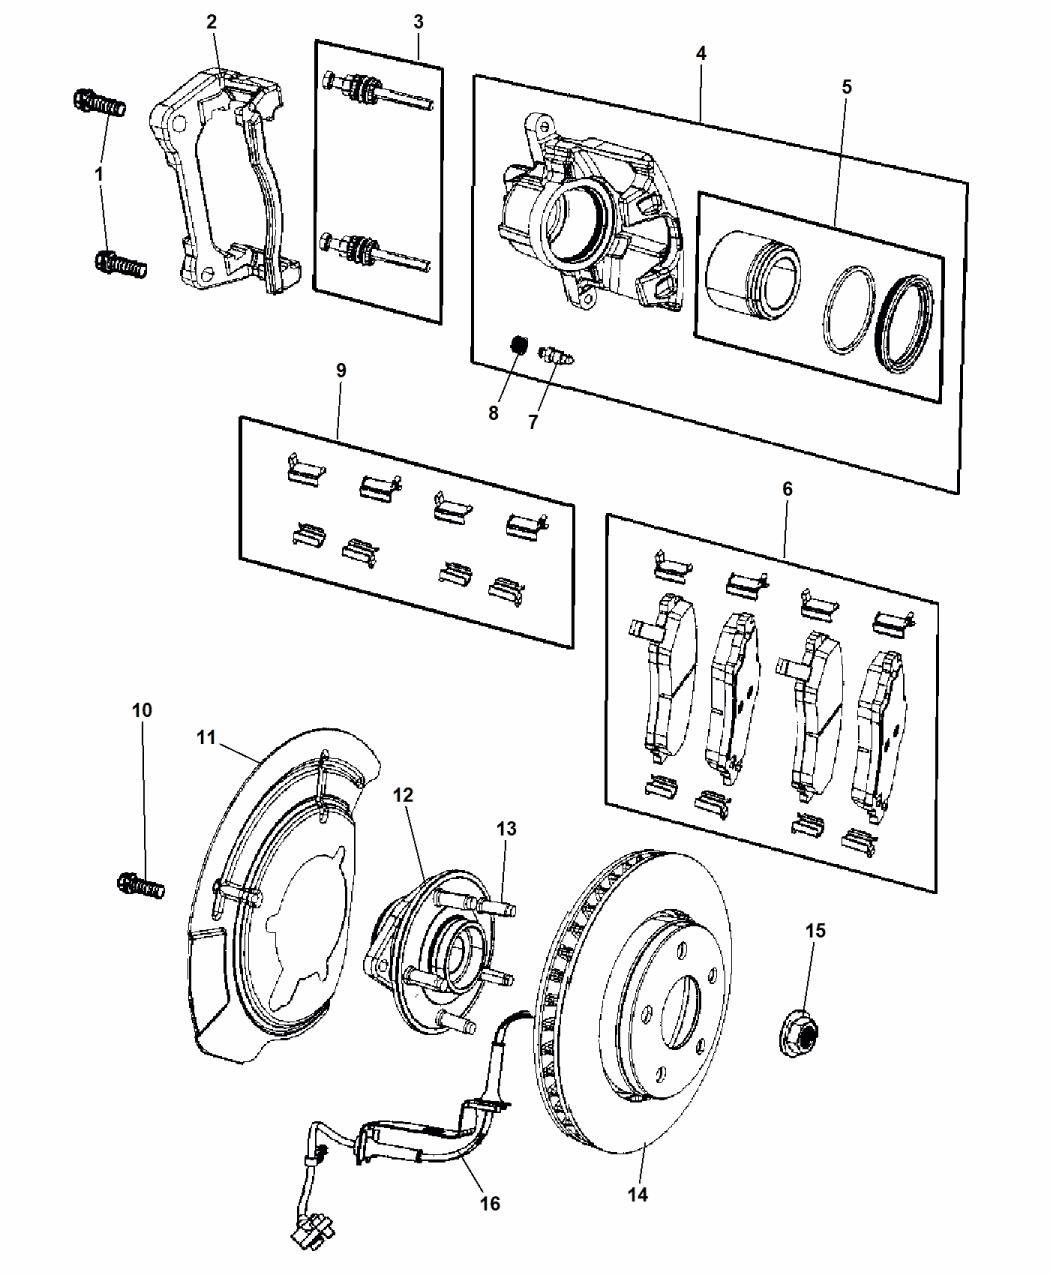 dz_9285] 07 dodge nitro engine diagram front wiring diagram  cajos denli mohammedshrine librar wiring 101